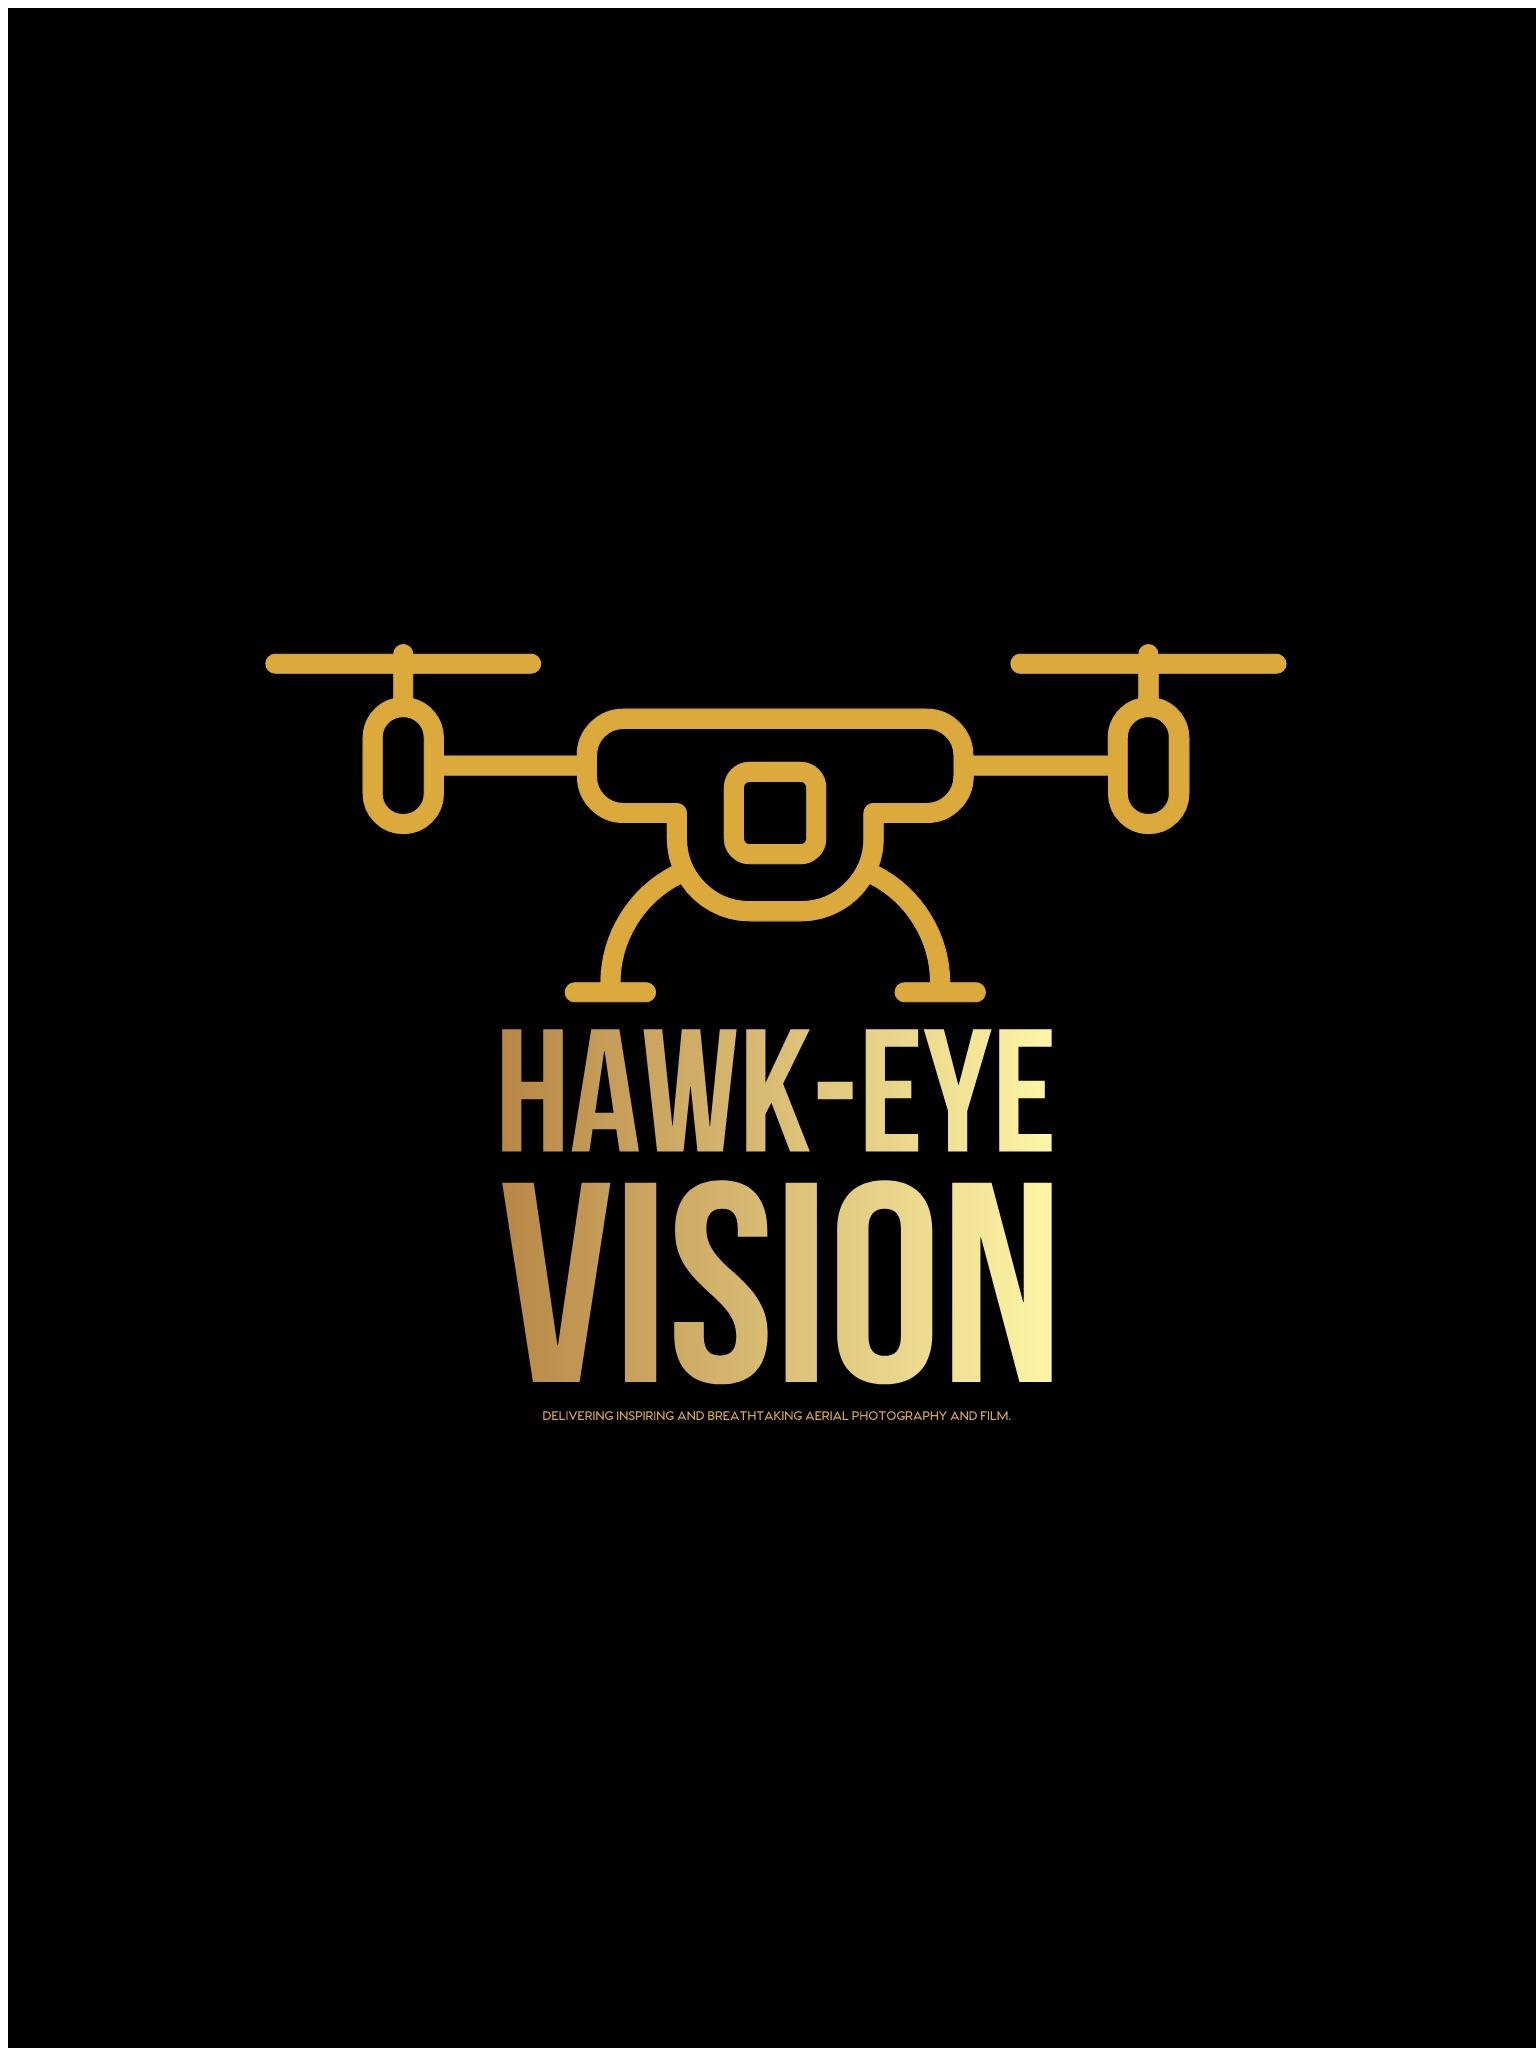 Hawk-Eye Vision ltd